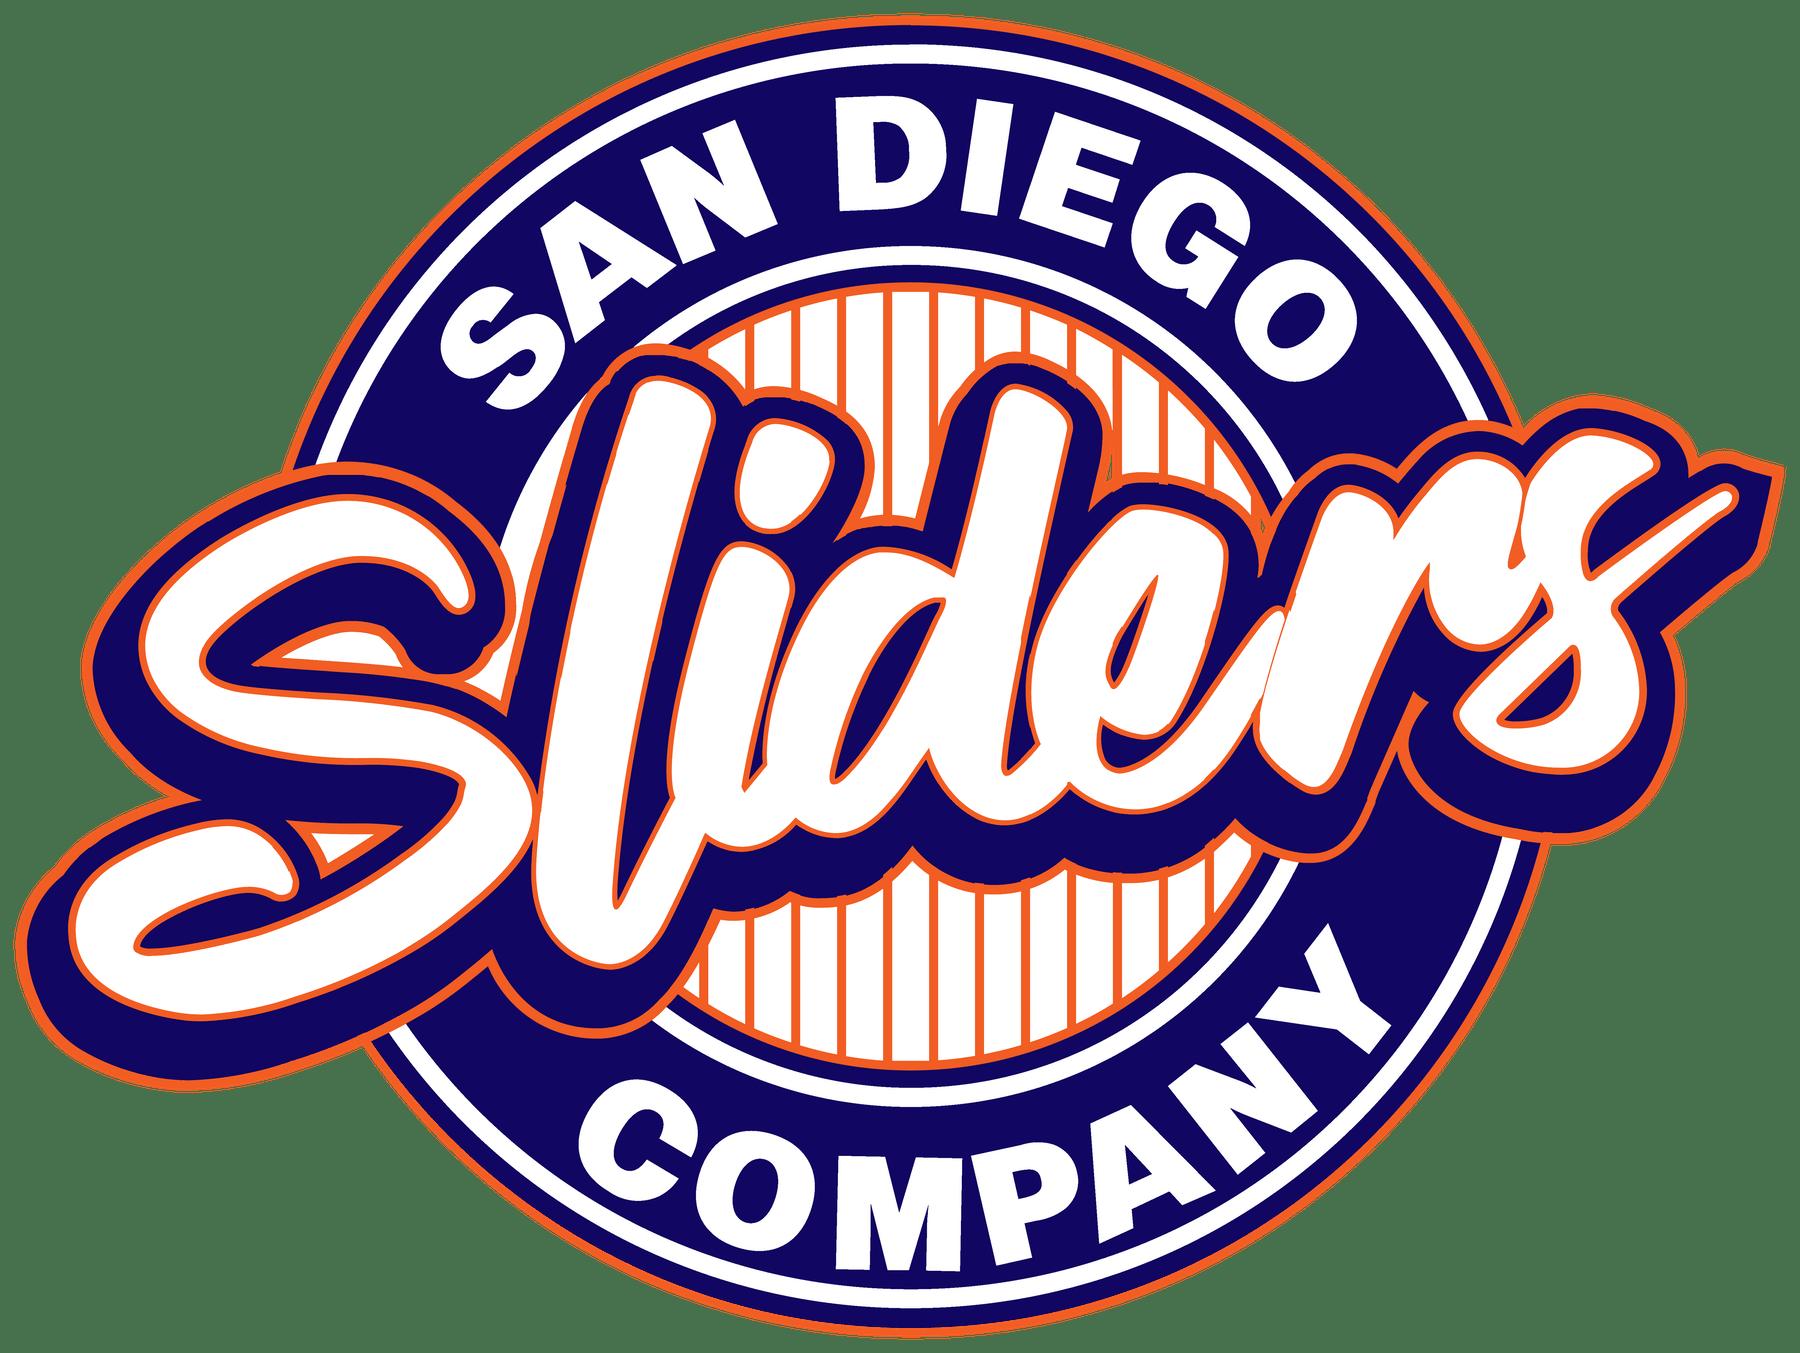 San Diego Sliders Co Home